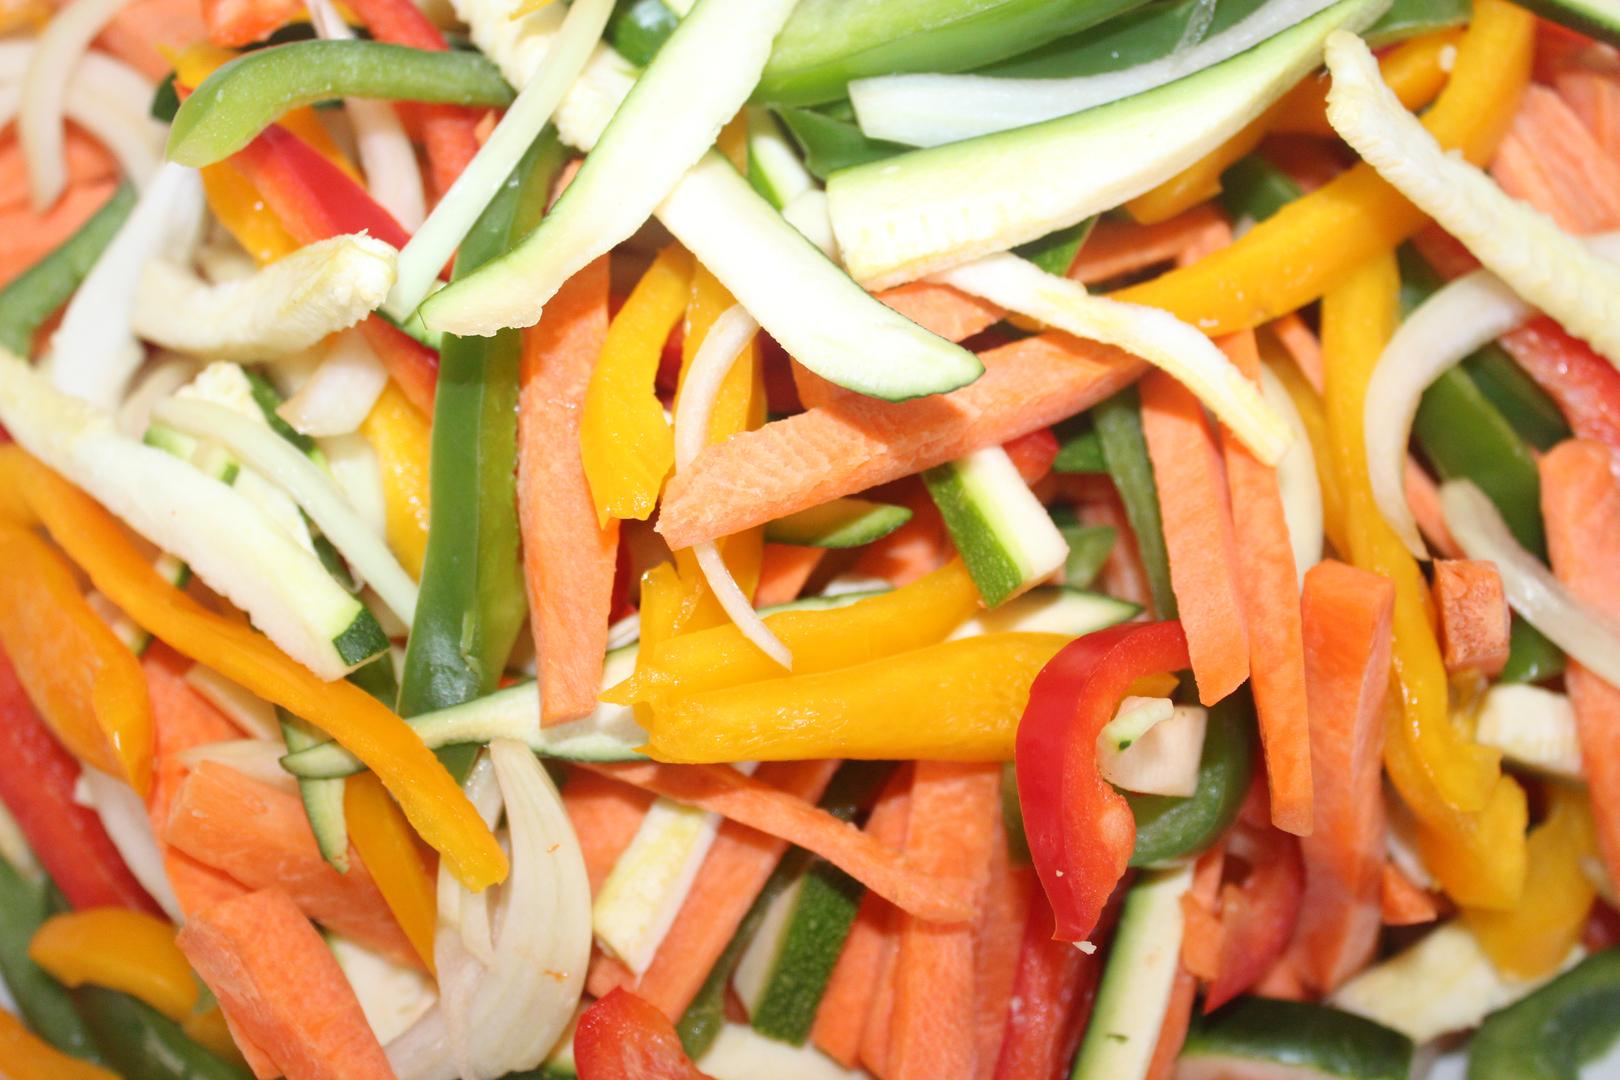 Simply Fresh Produce